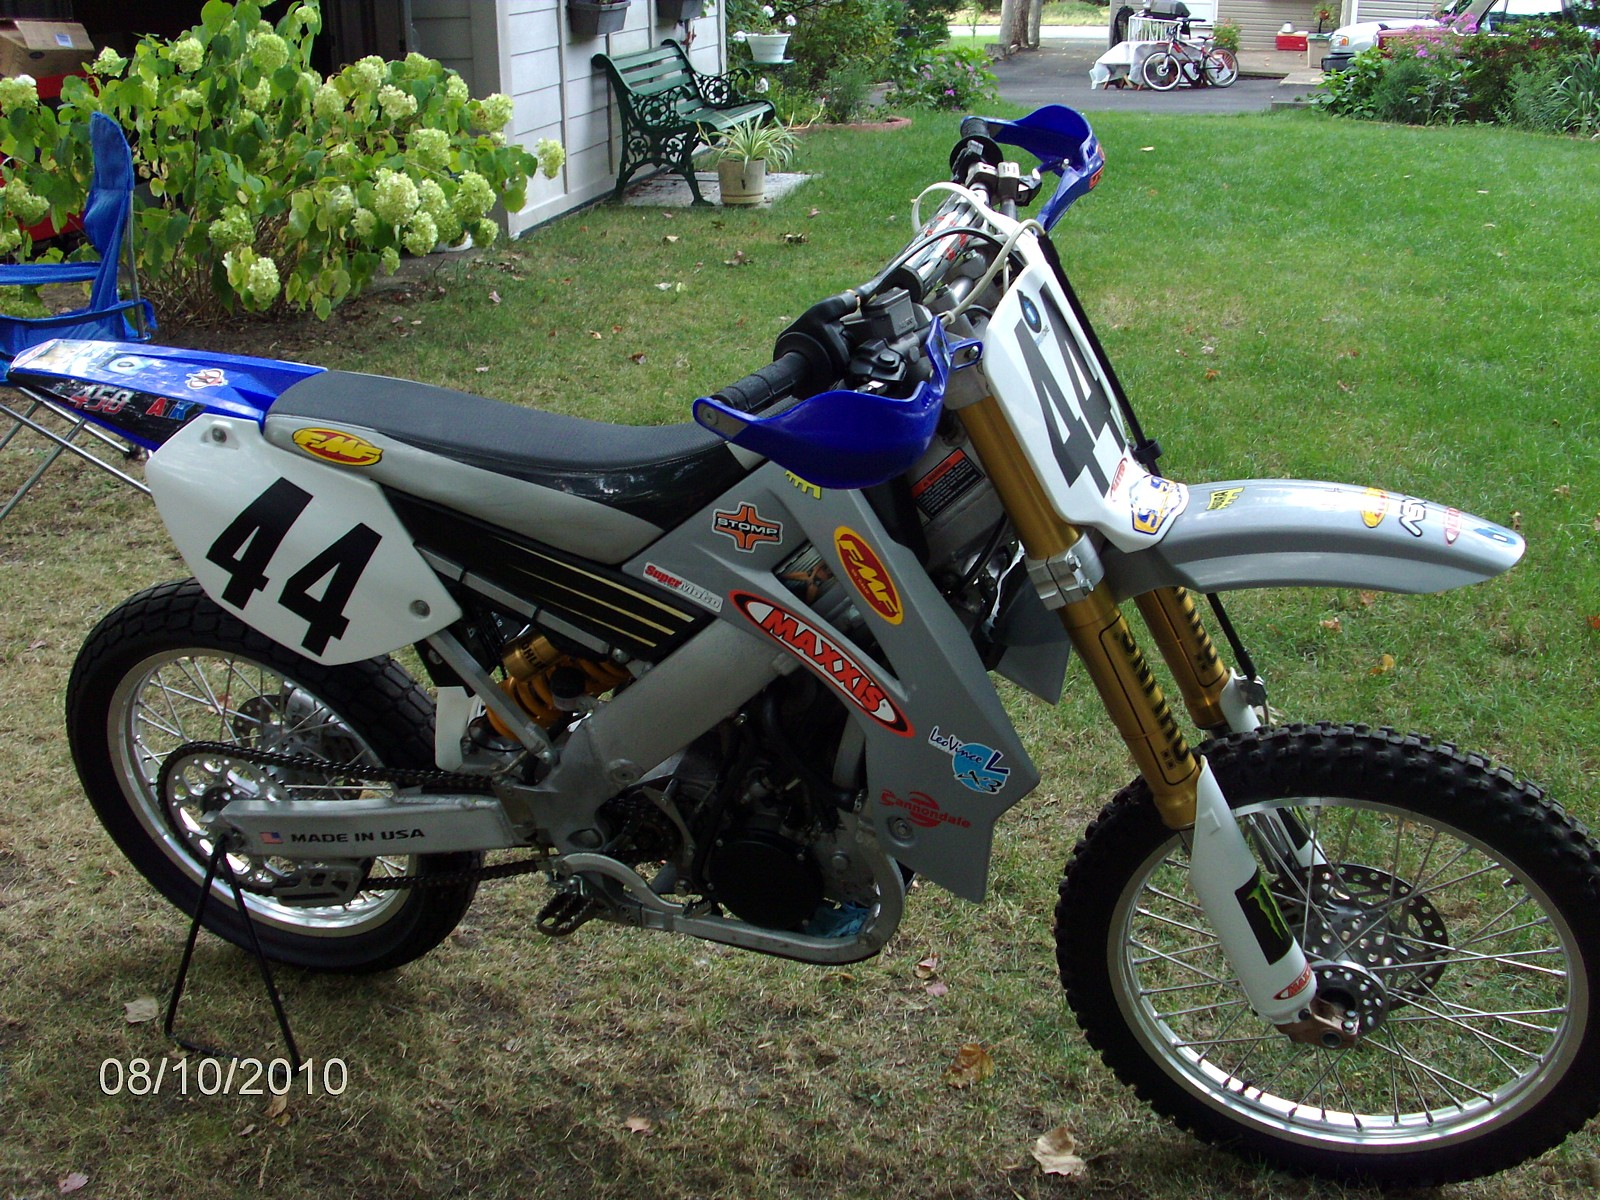 ATK/Cannondale 450MX - racerxusa - Motocross Pictures - Vital MX